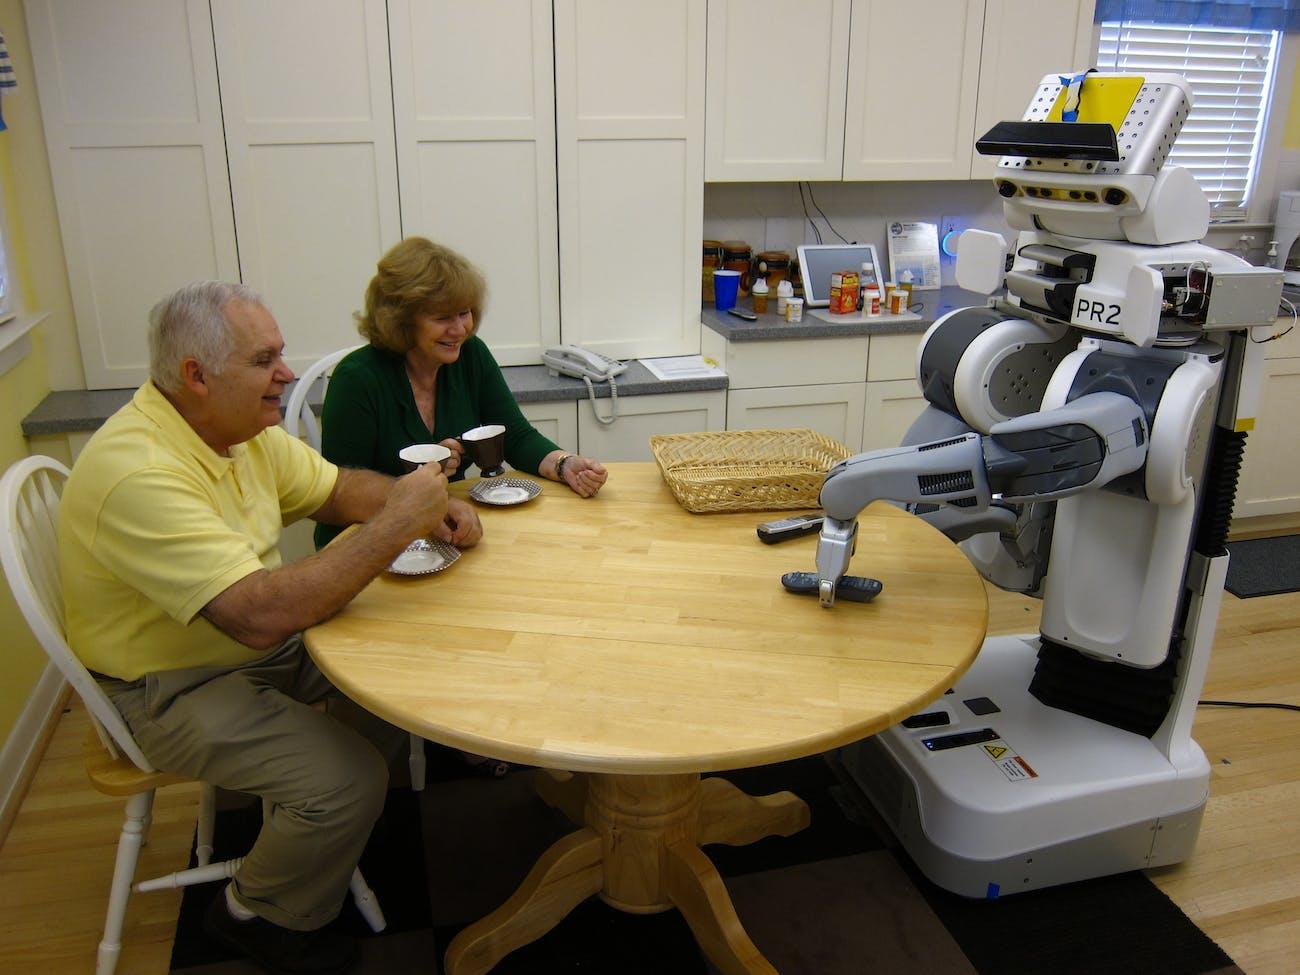 Eldercare Robot